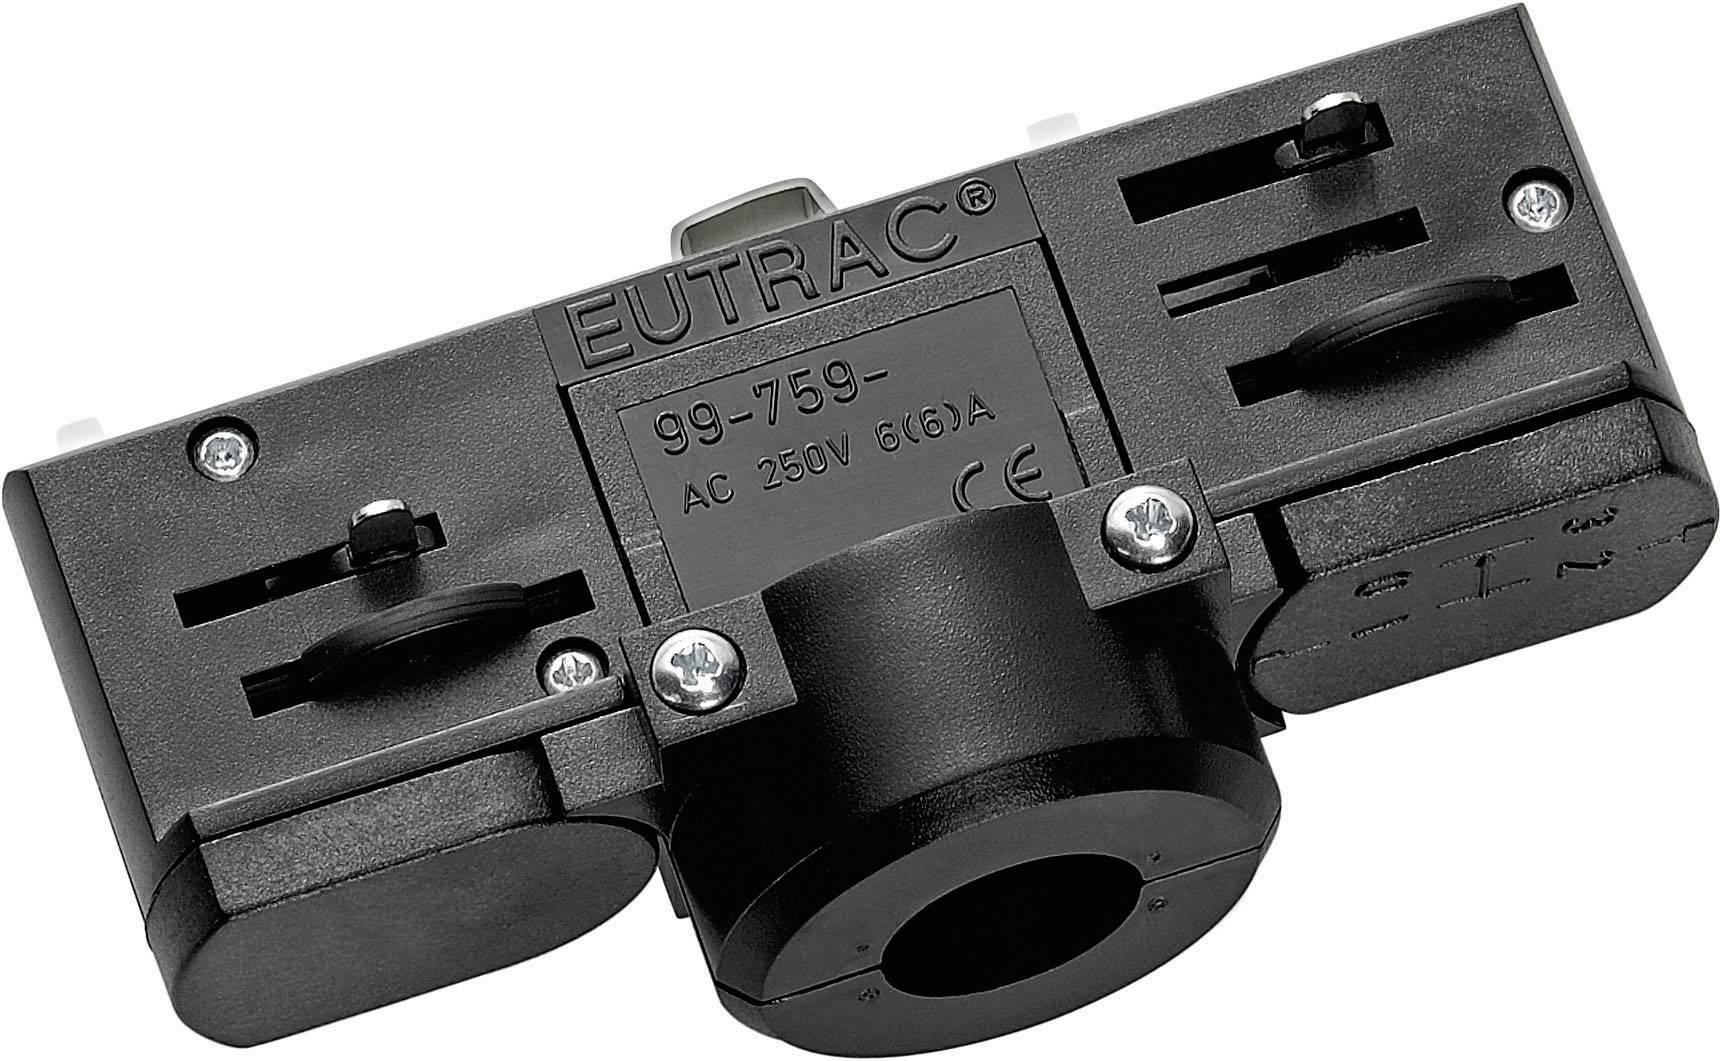 Adaptér lišty - vysokonapěť. komponent lištových systémů Eutrac 145990, černá